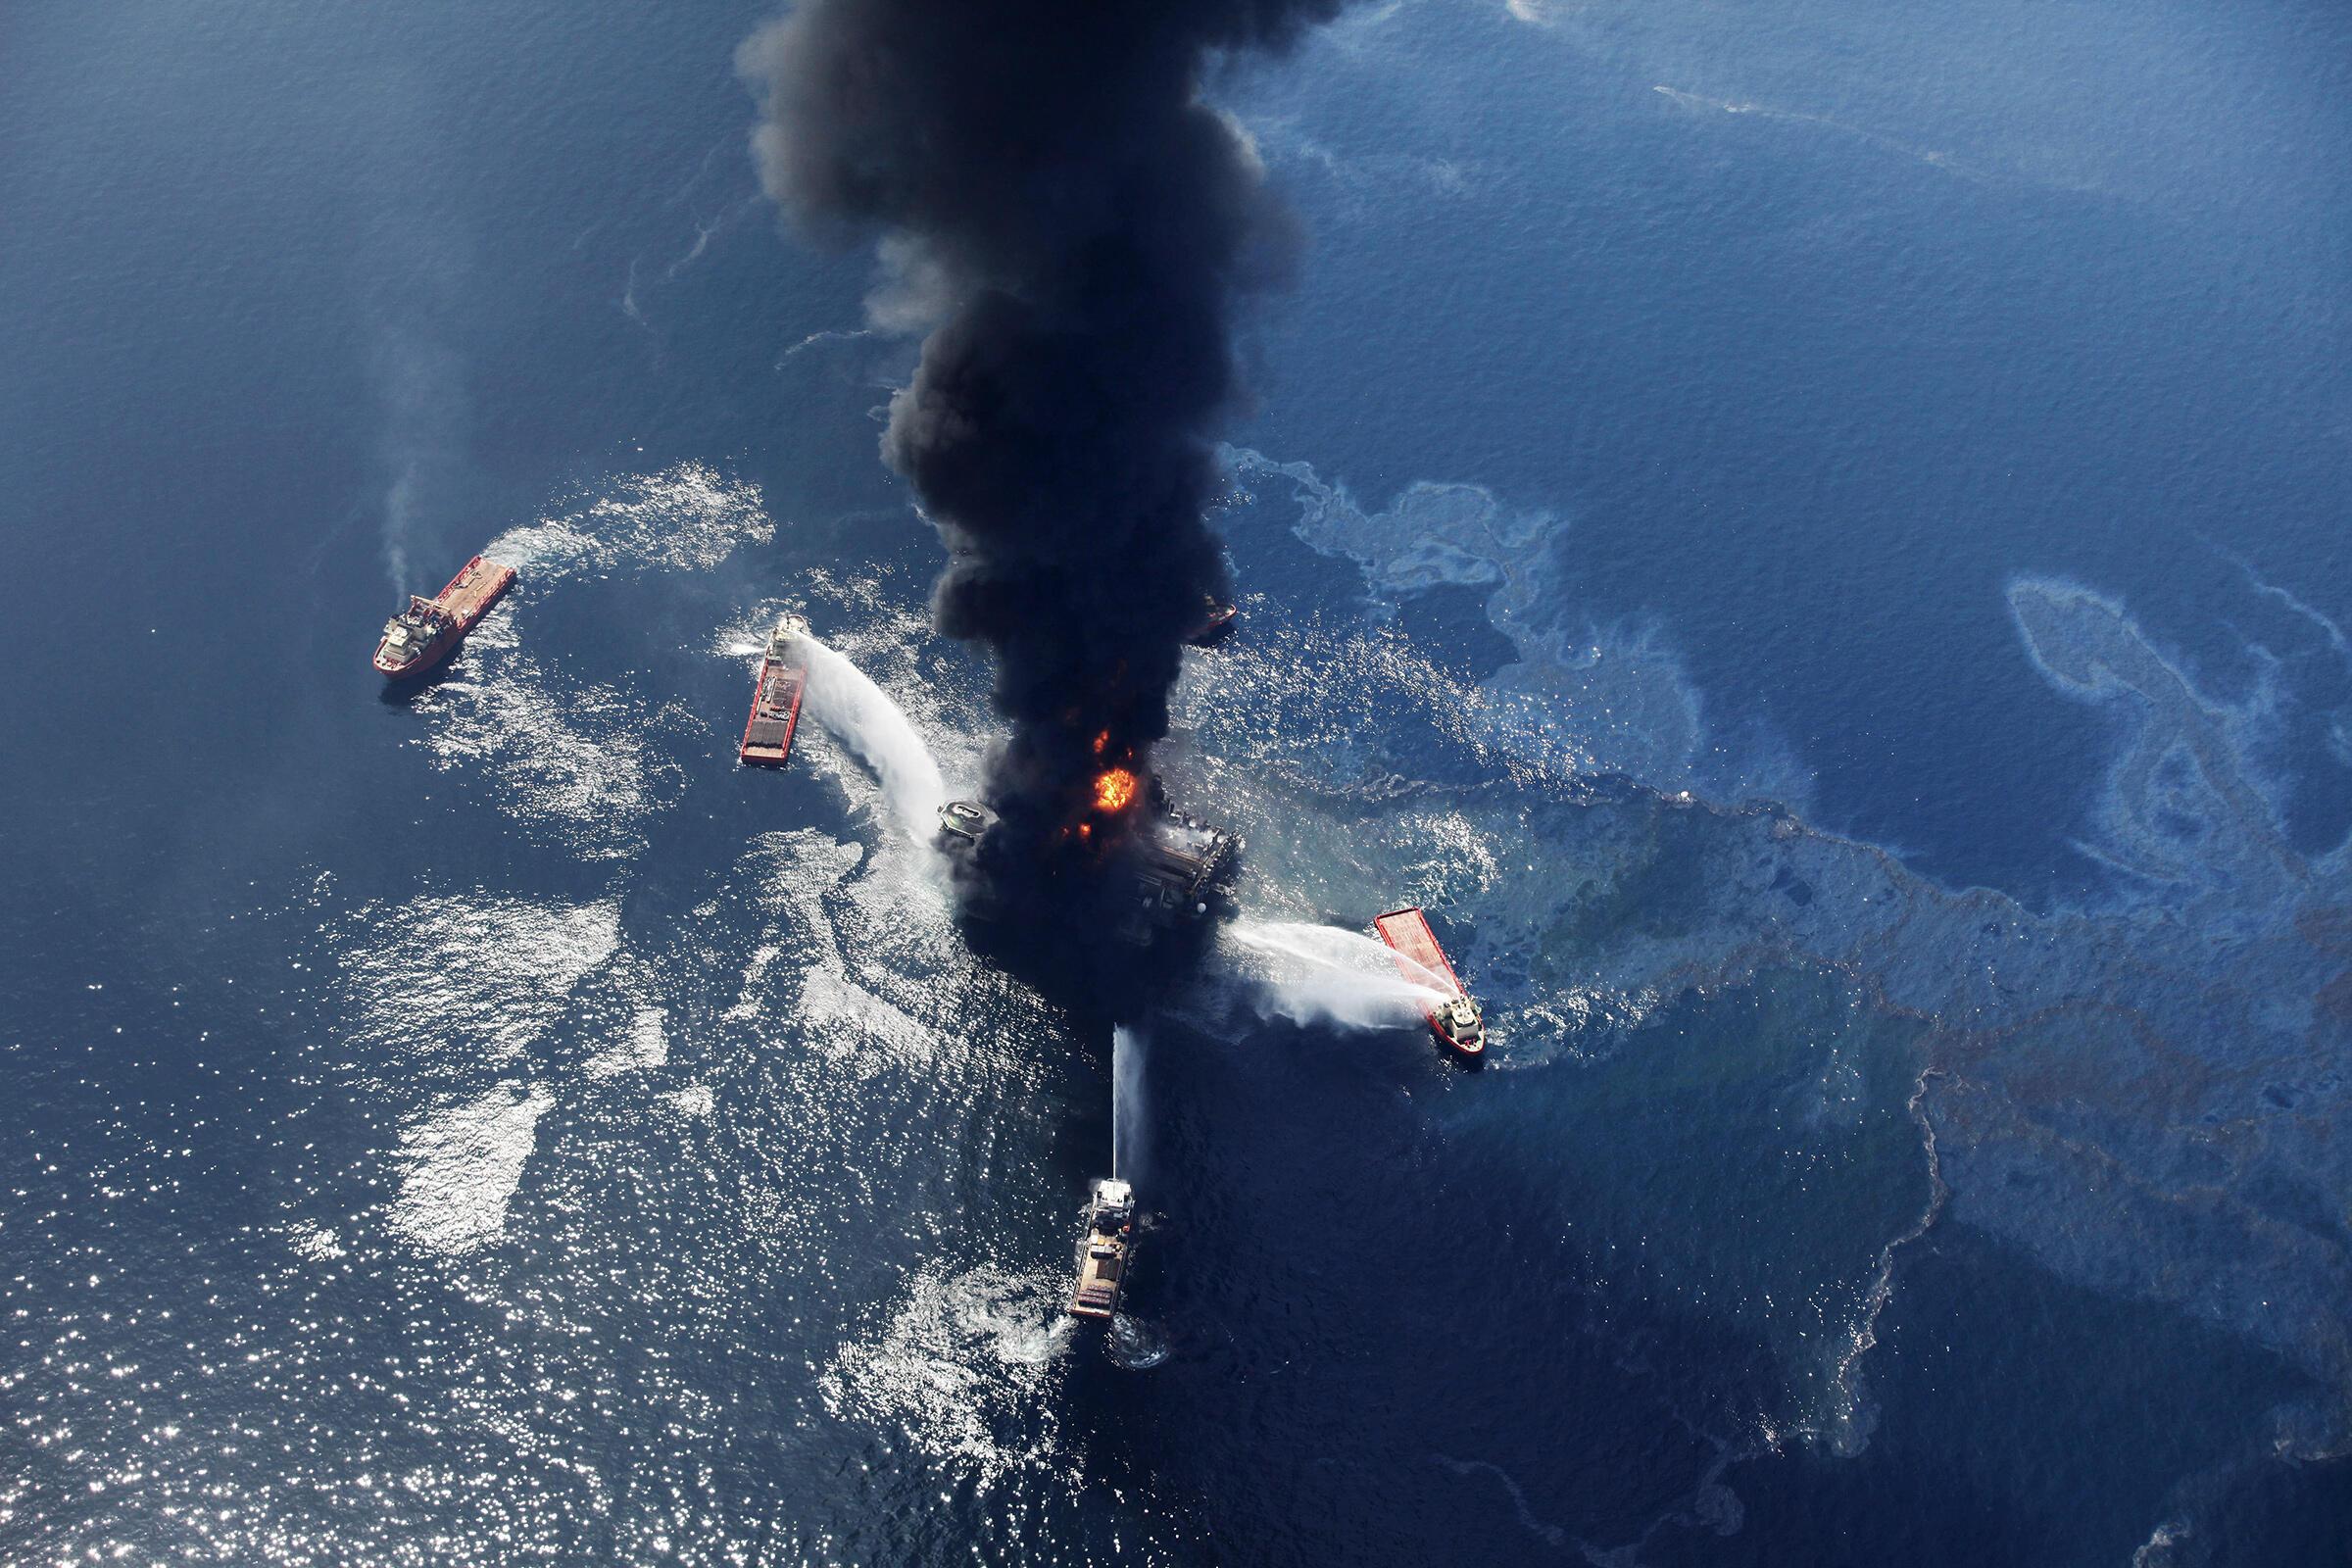 The oil slick burning on Wednesday, April 21, 2010, seen next to the Deepwater Horizon oil rig. Gerald Herbert/AP